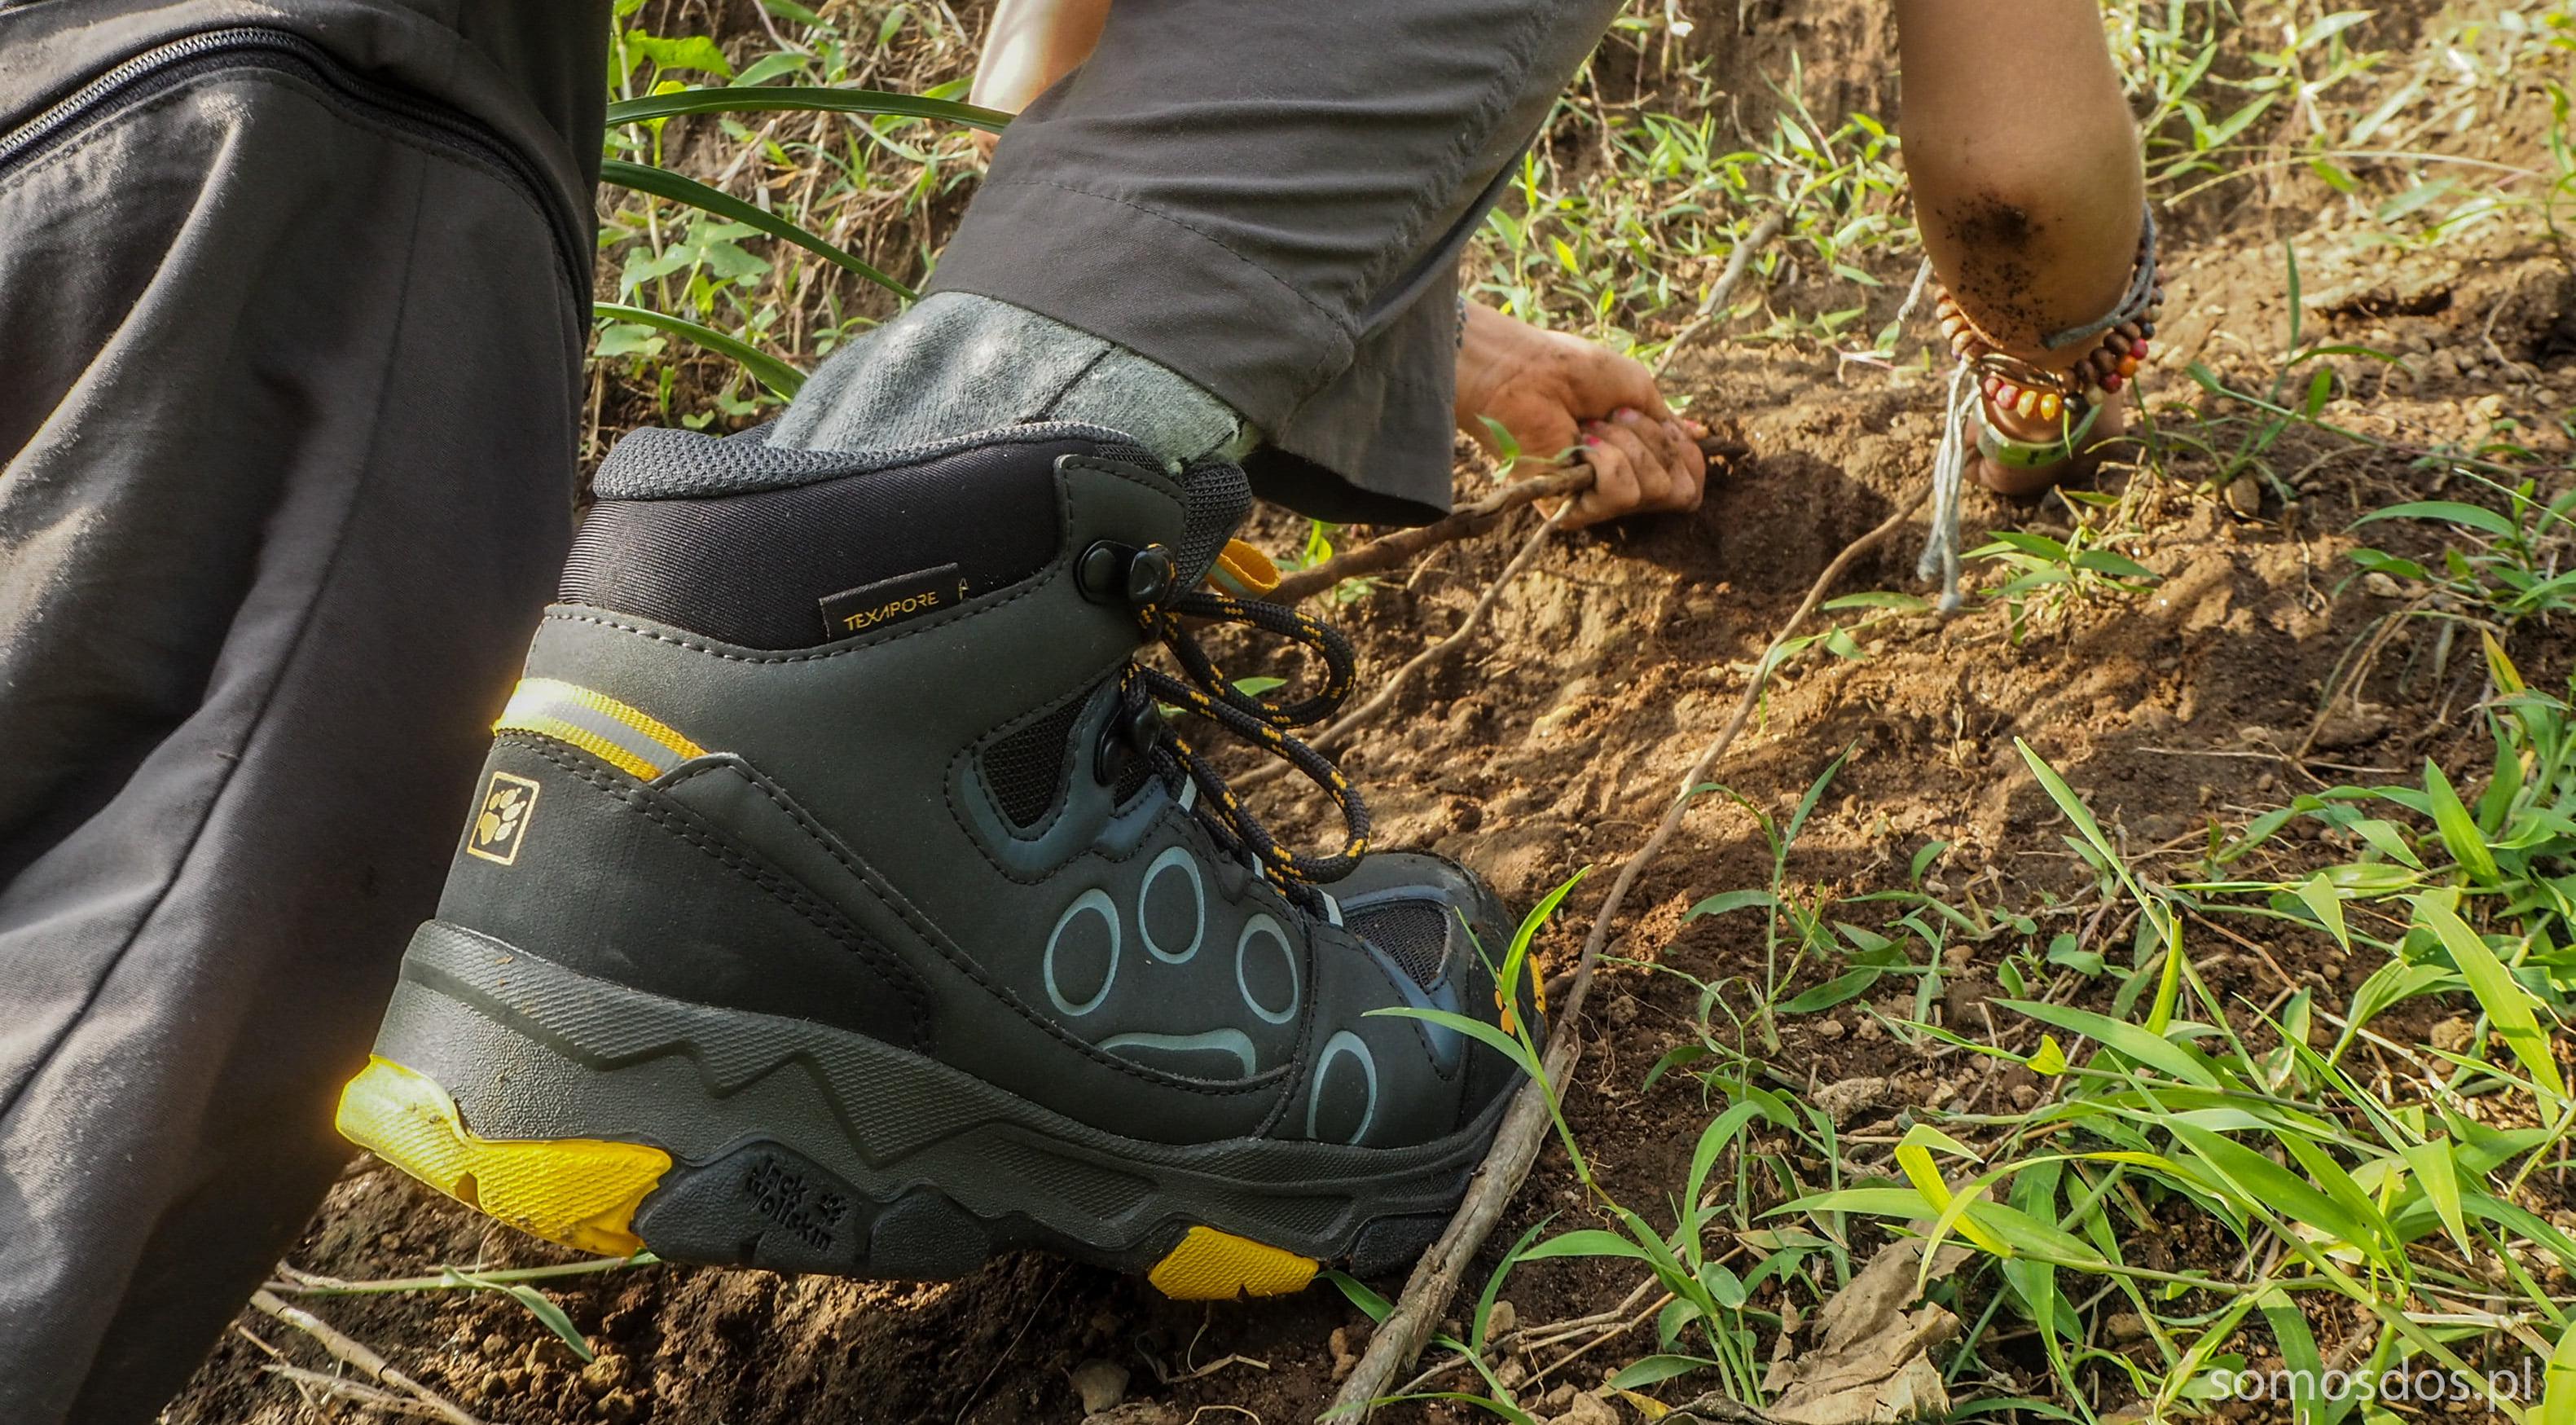 MTN Attack 2 buty trekkingowe dla dzieci jack wolfskin